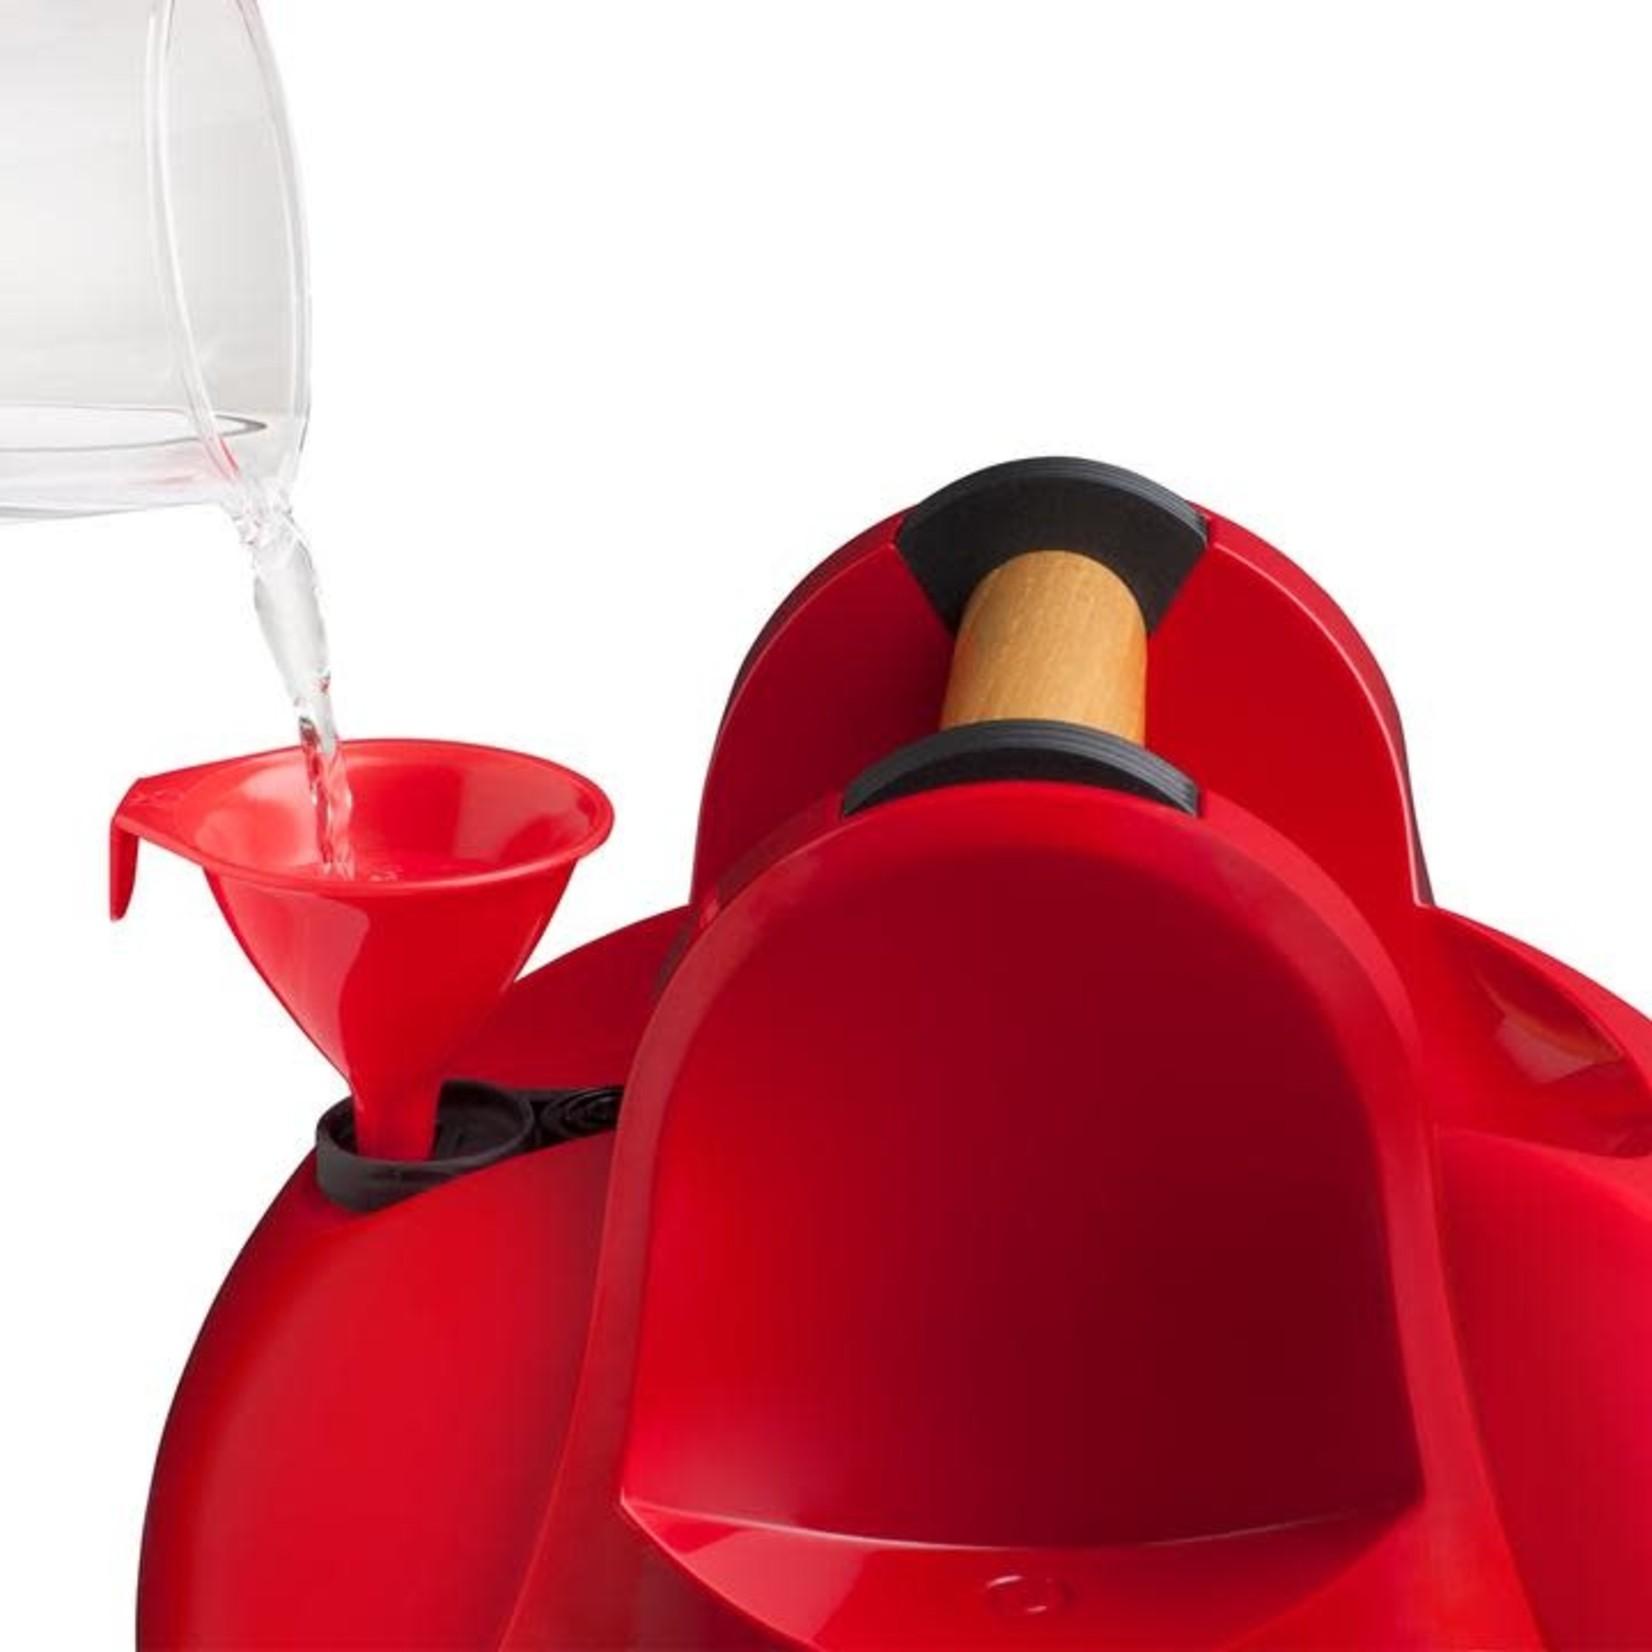 Advanced Vapor Advanced Vapor Ladybug Steamer - TEKNO 2350